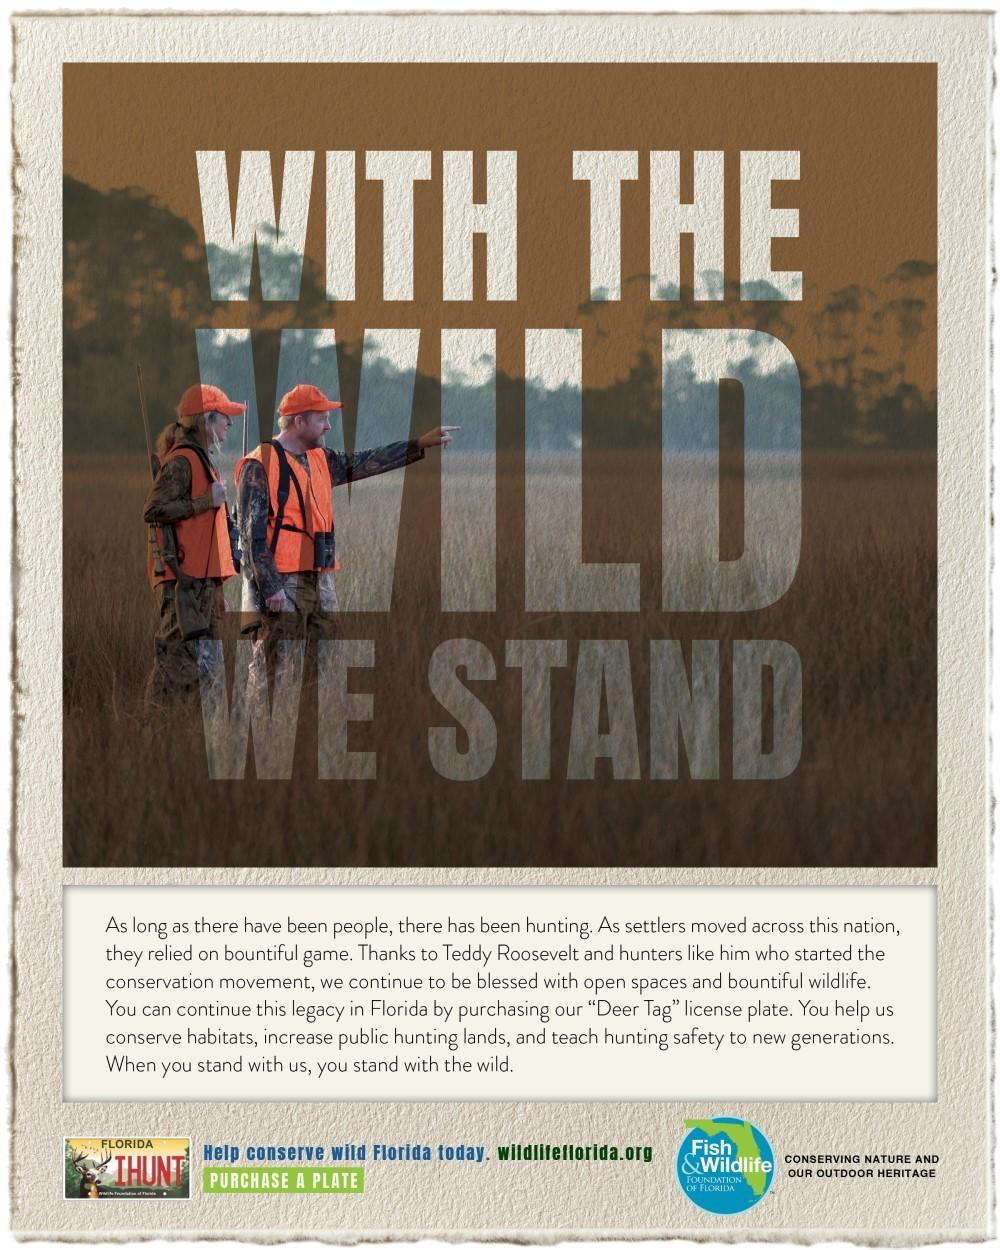 Fish and Wildlife Foundation of Florida